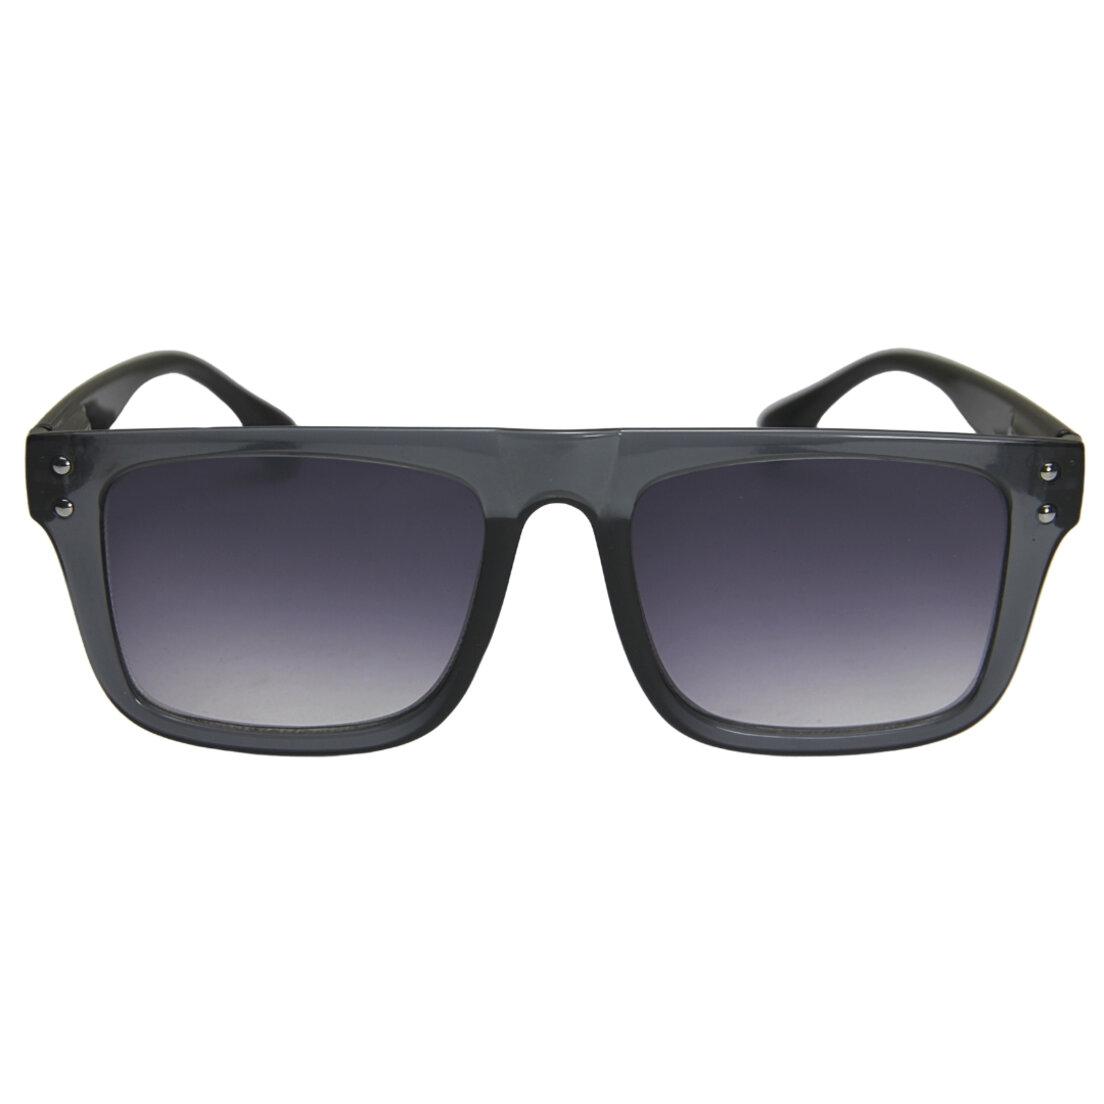 Óculos de Sol Khatto Square Direct - C046